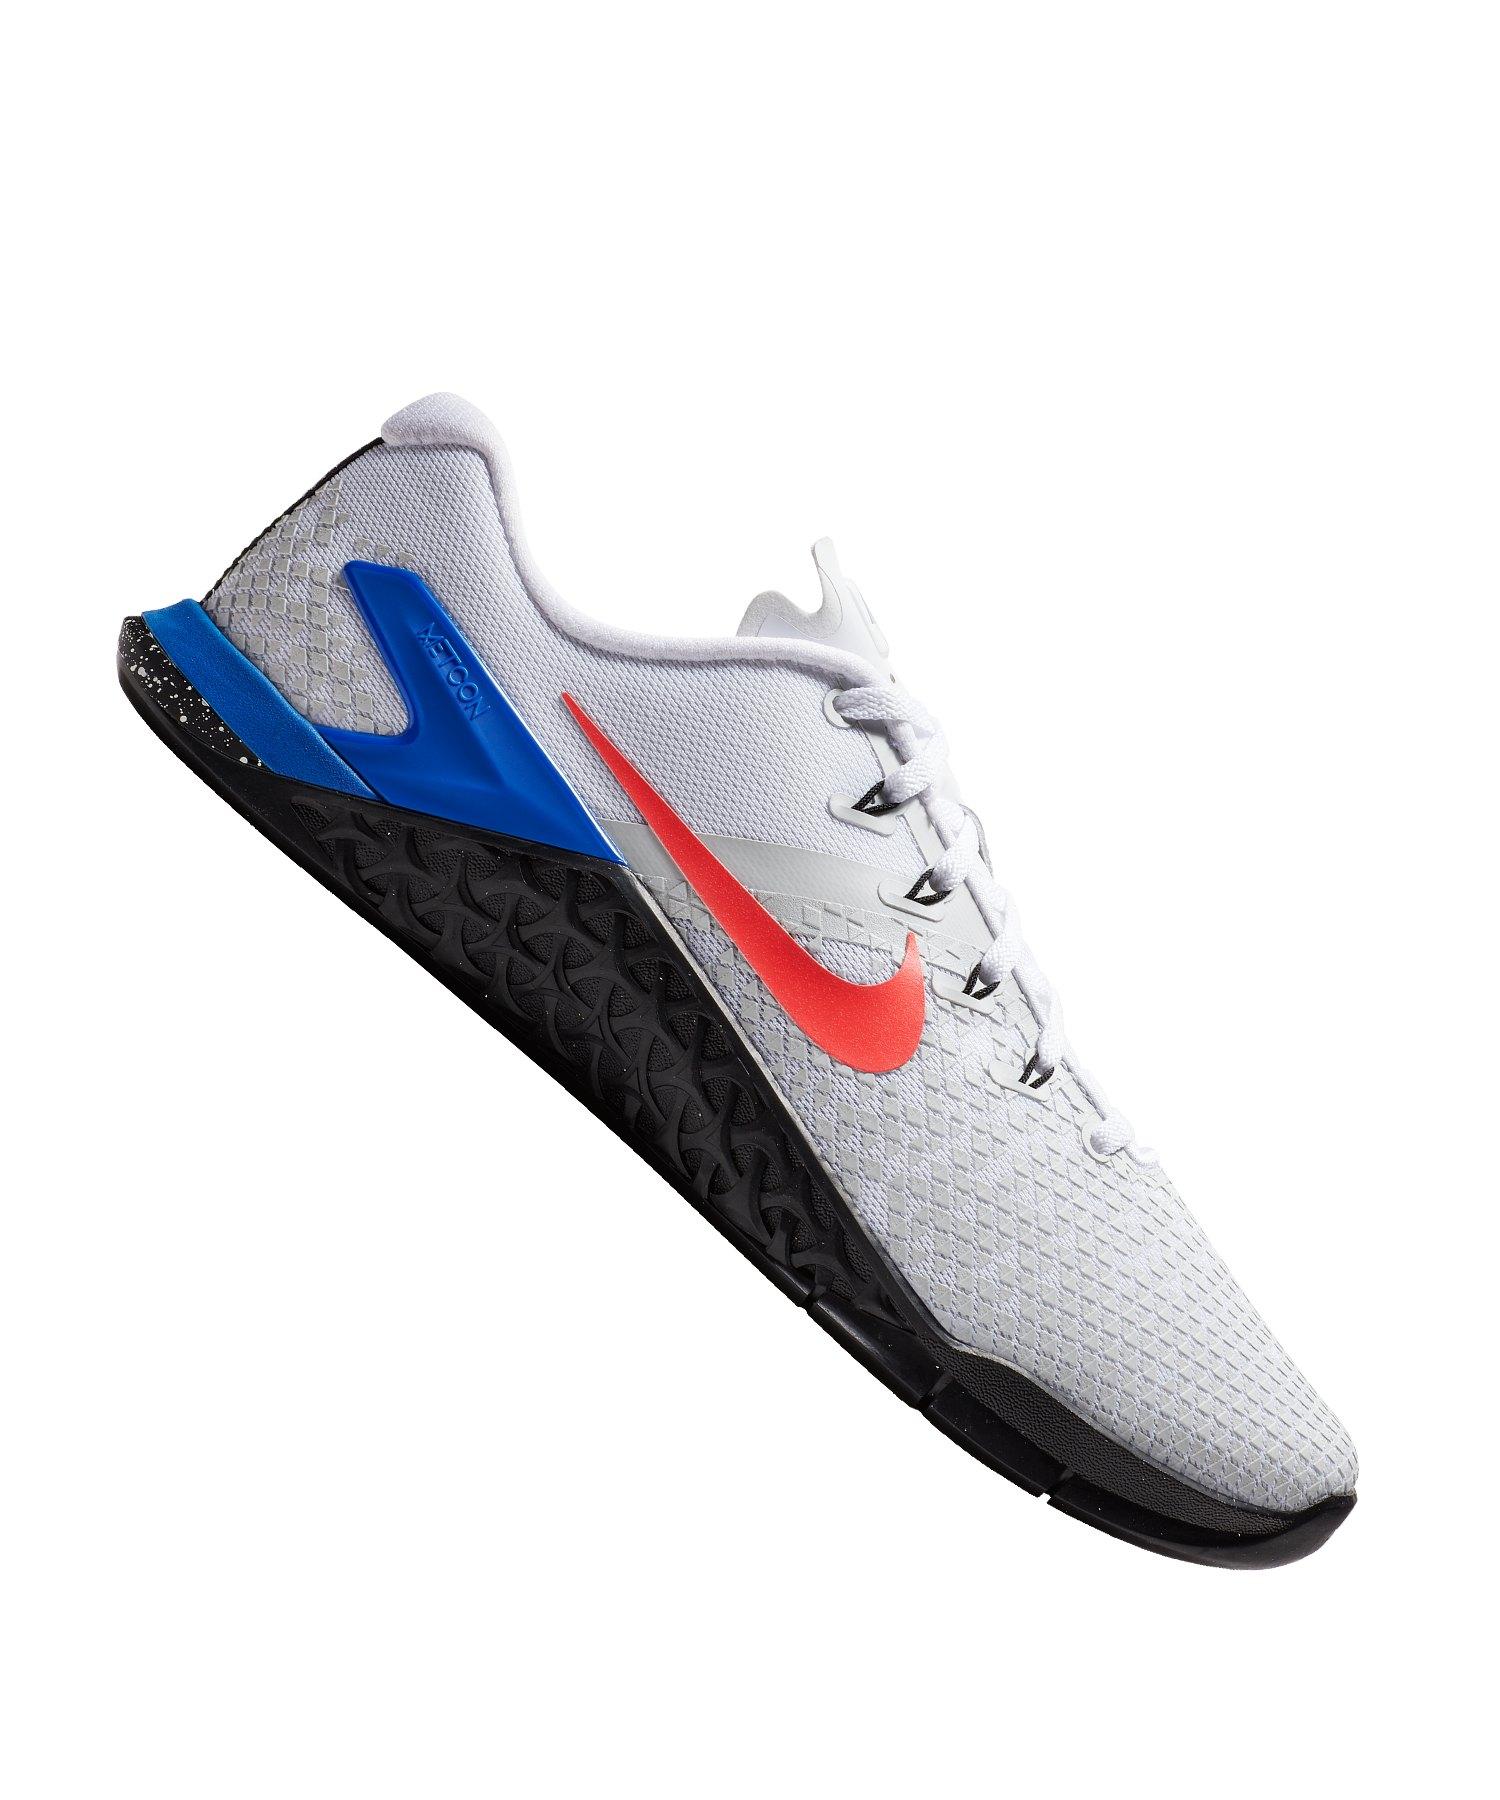 new arrivals c9bcf 4da58 Nike Metcon 4 XD Training Schwarz Weiss F164 - schwarz